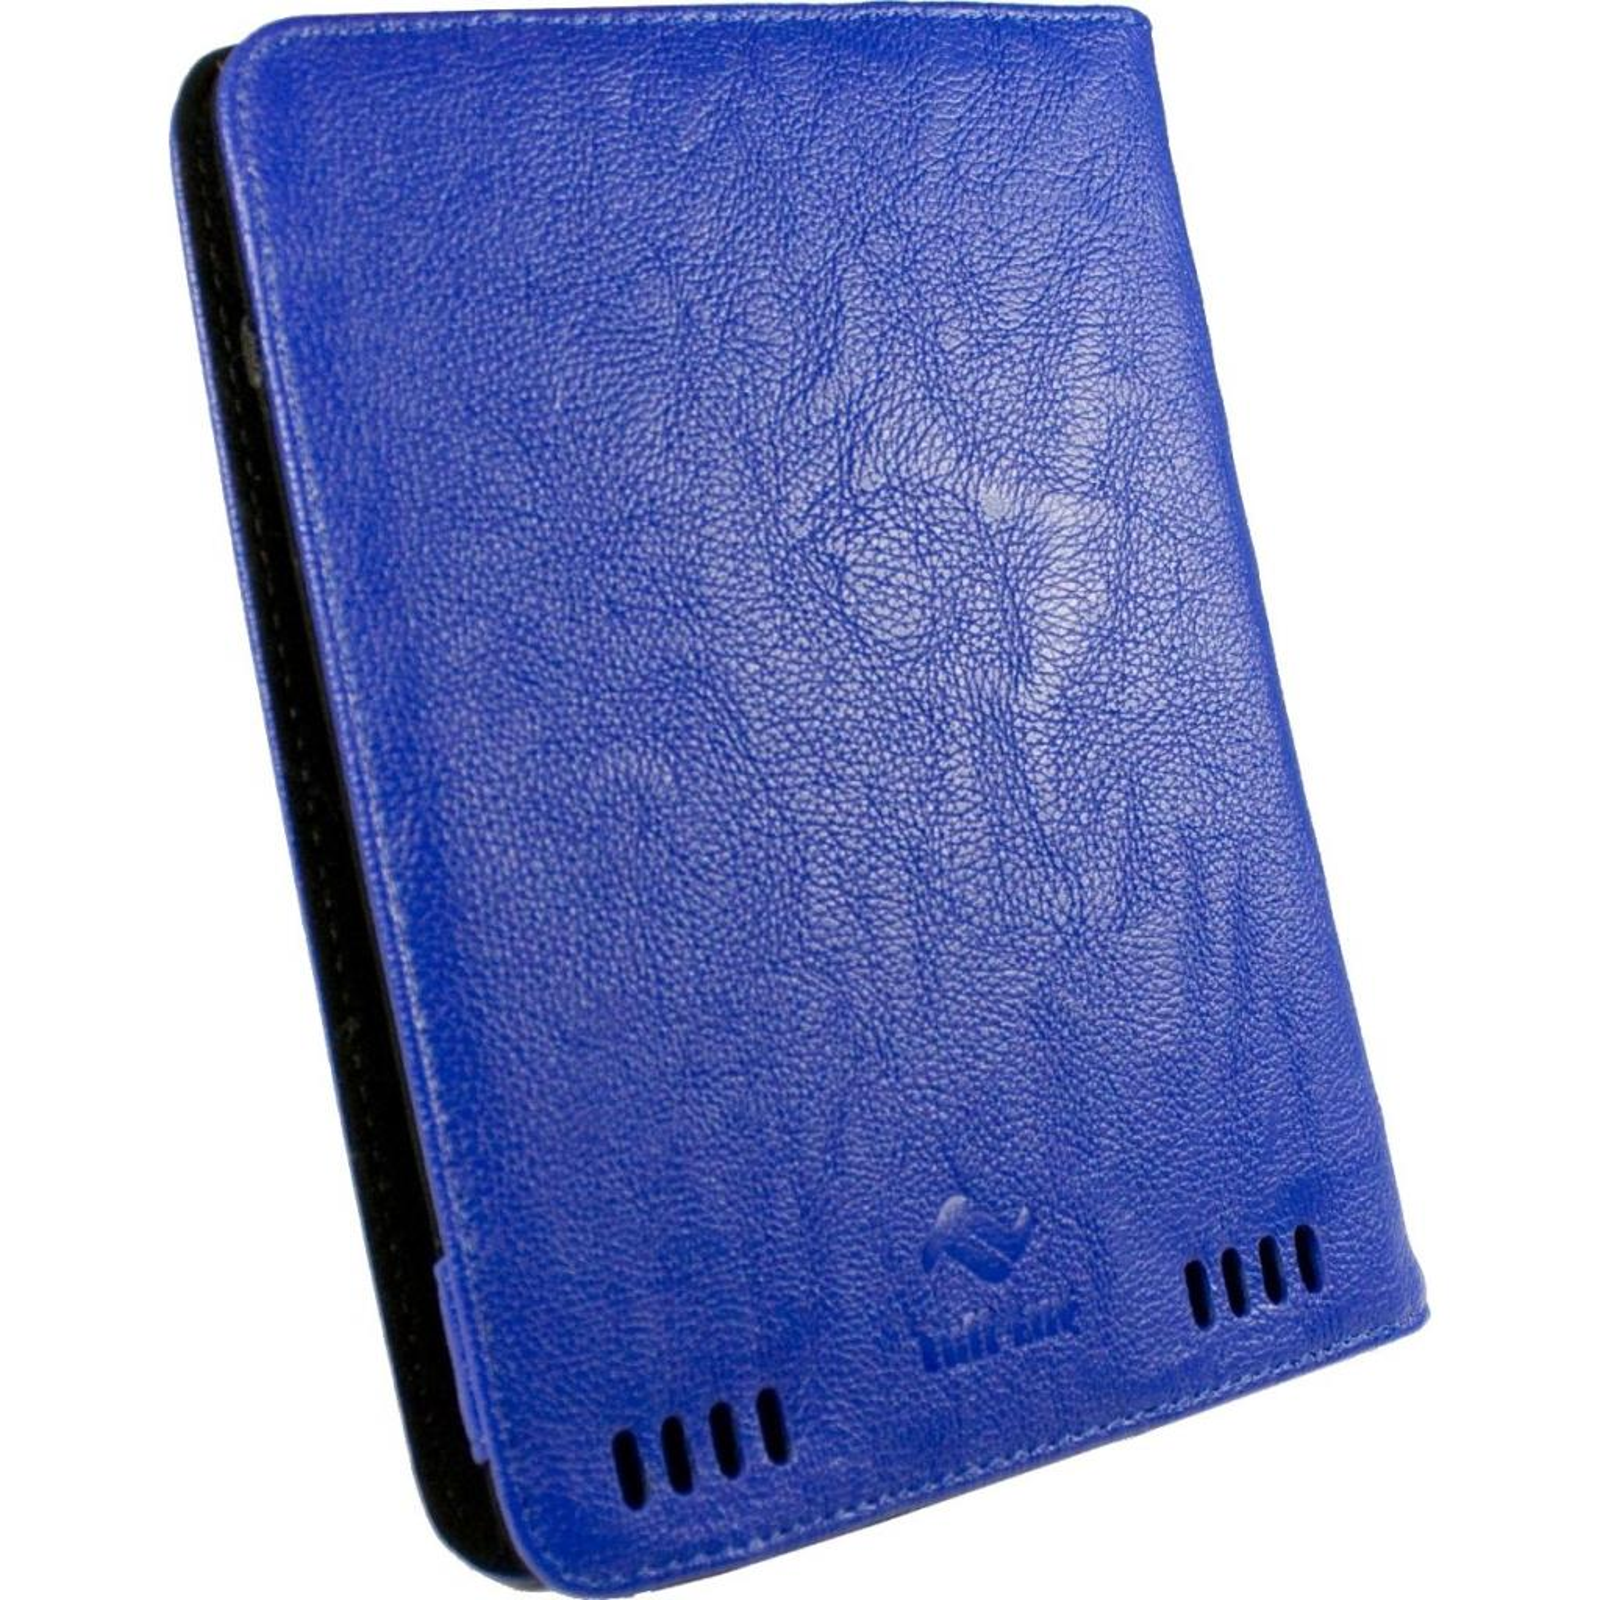 Чехол для электронной книги Tuff-Luv 6 Embrace faux leather/Electric Blue (C4_53) изображение 2